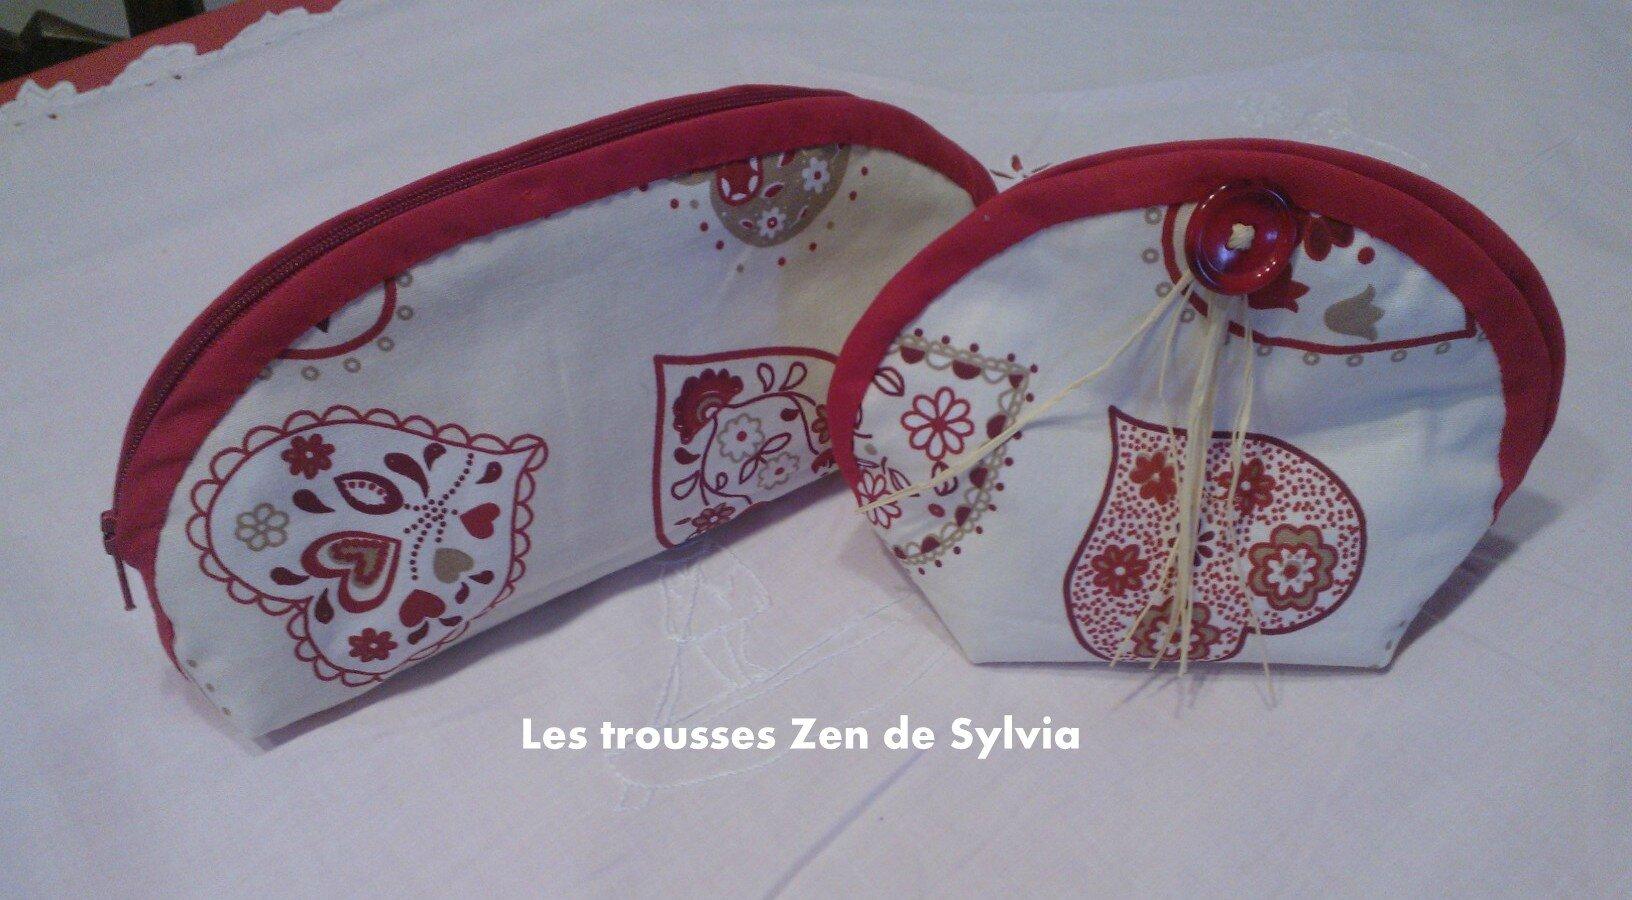 Trousse Zen 34 Sylvia